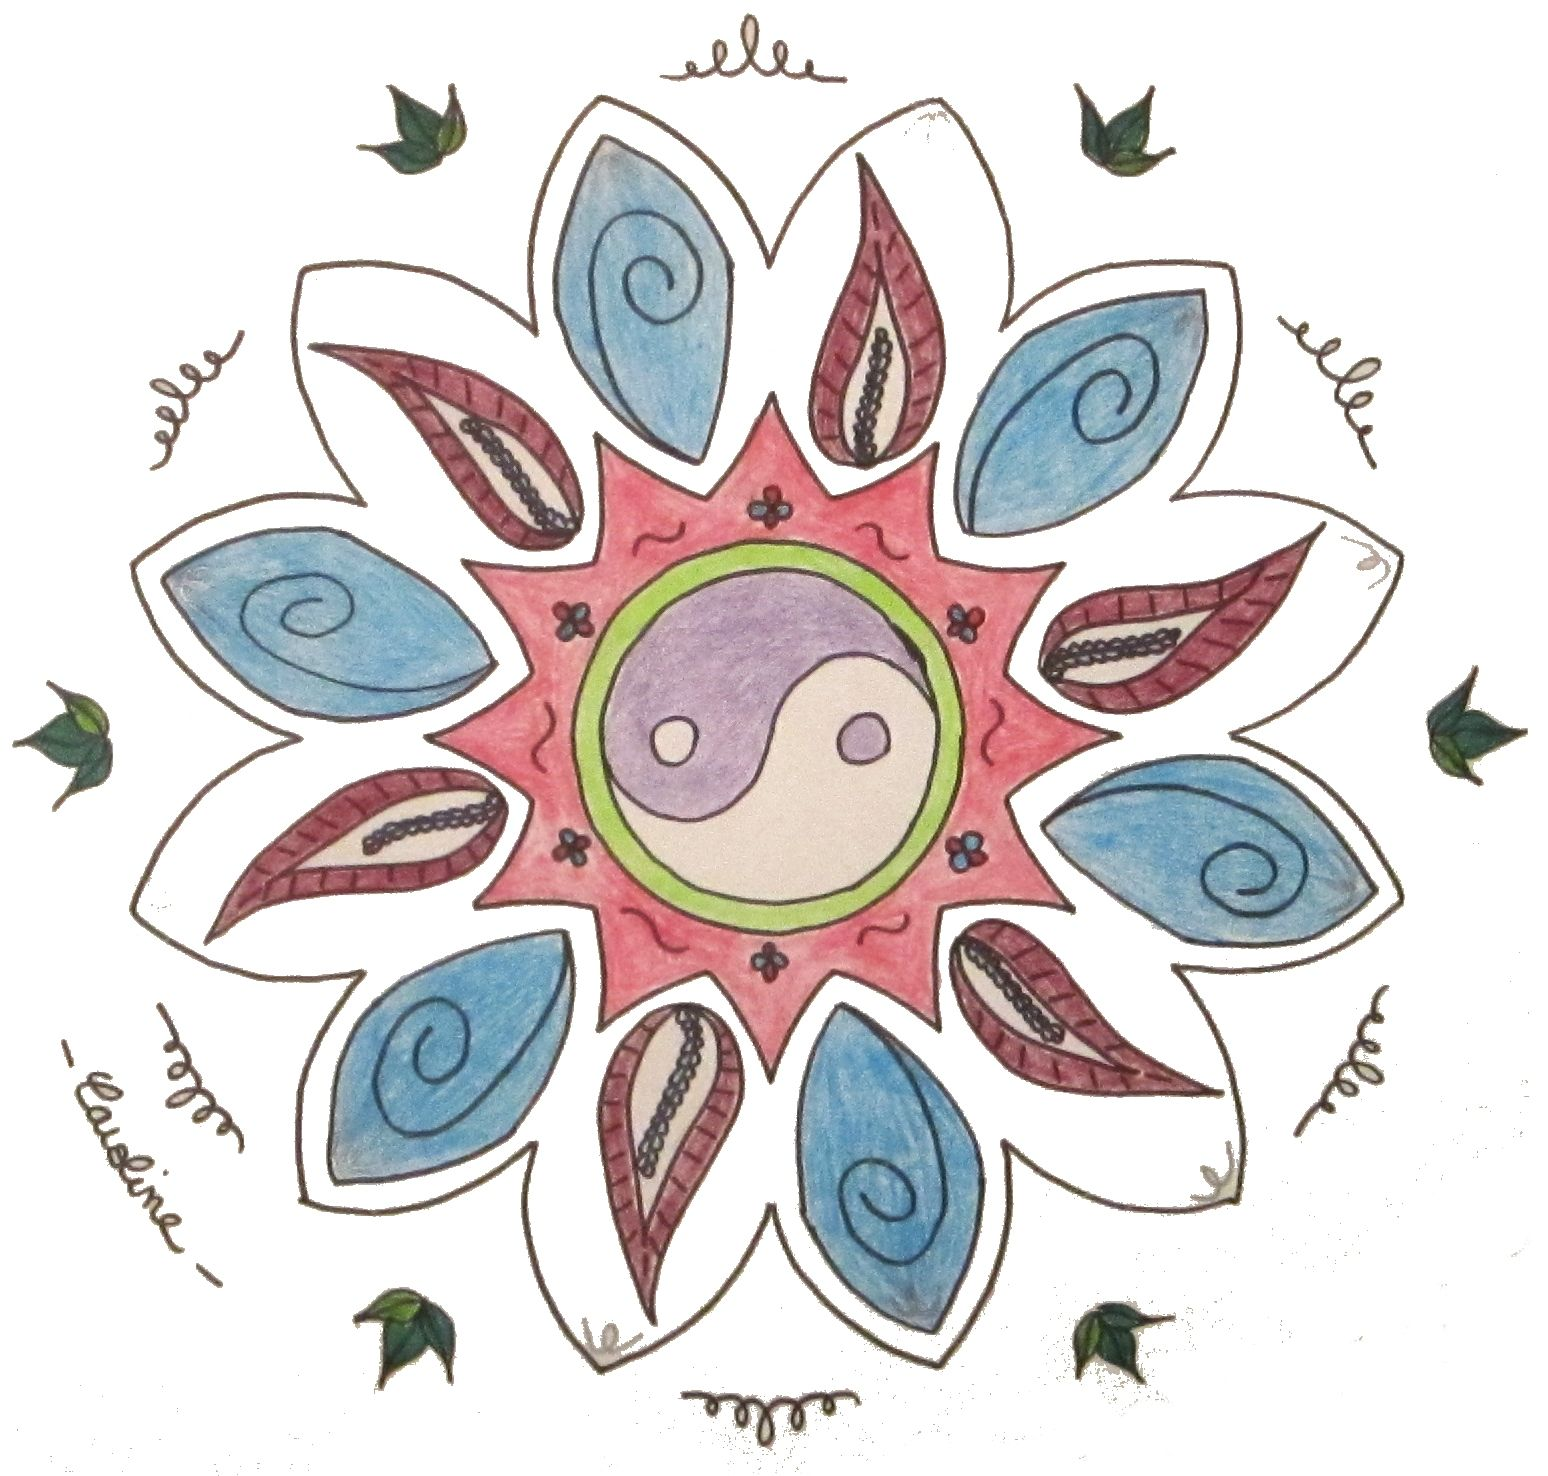 #Mandala #Ying et #Yang